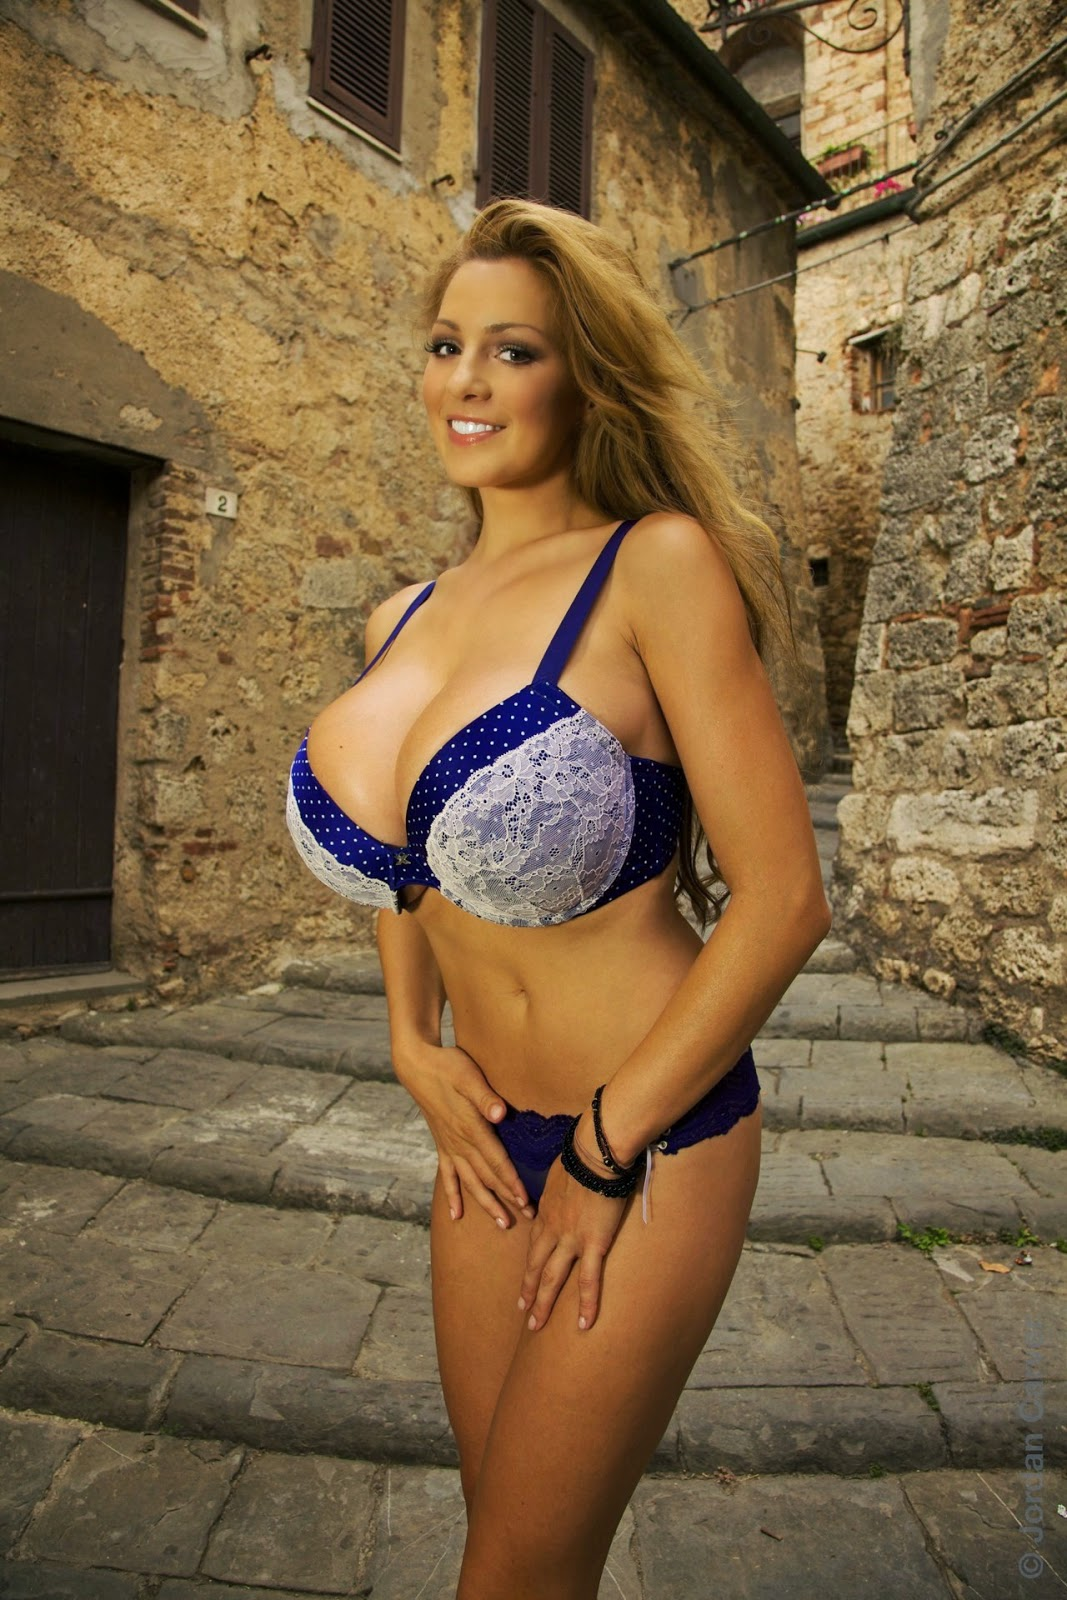 Jordan Carver Gorgeous Hot Beauty In Blu Bra And Panty -5744